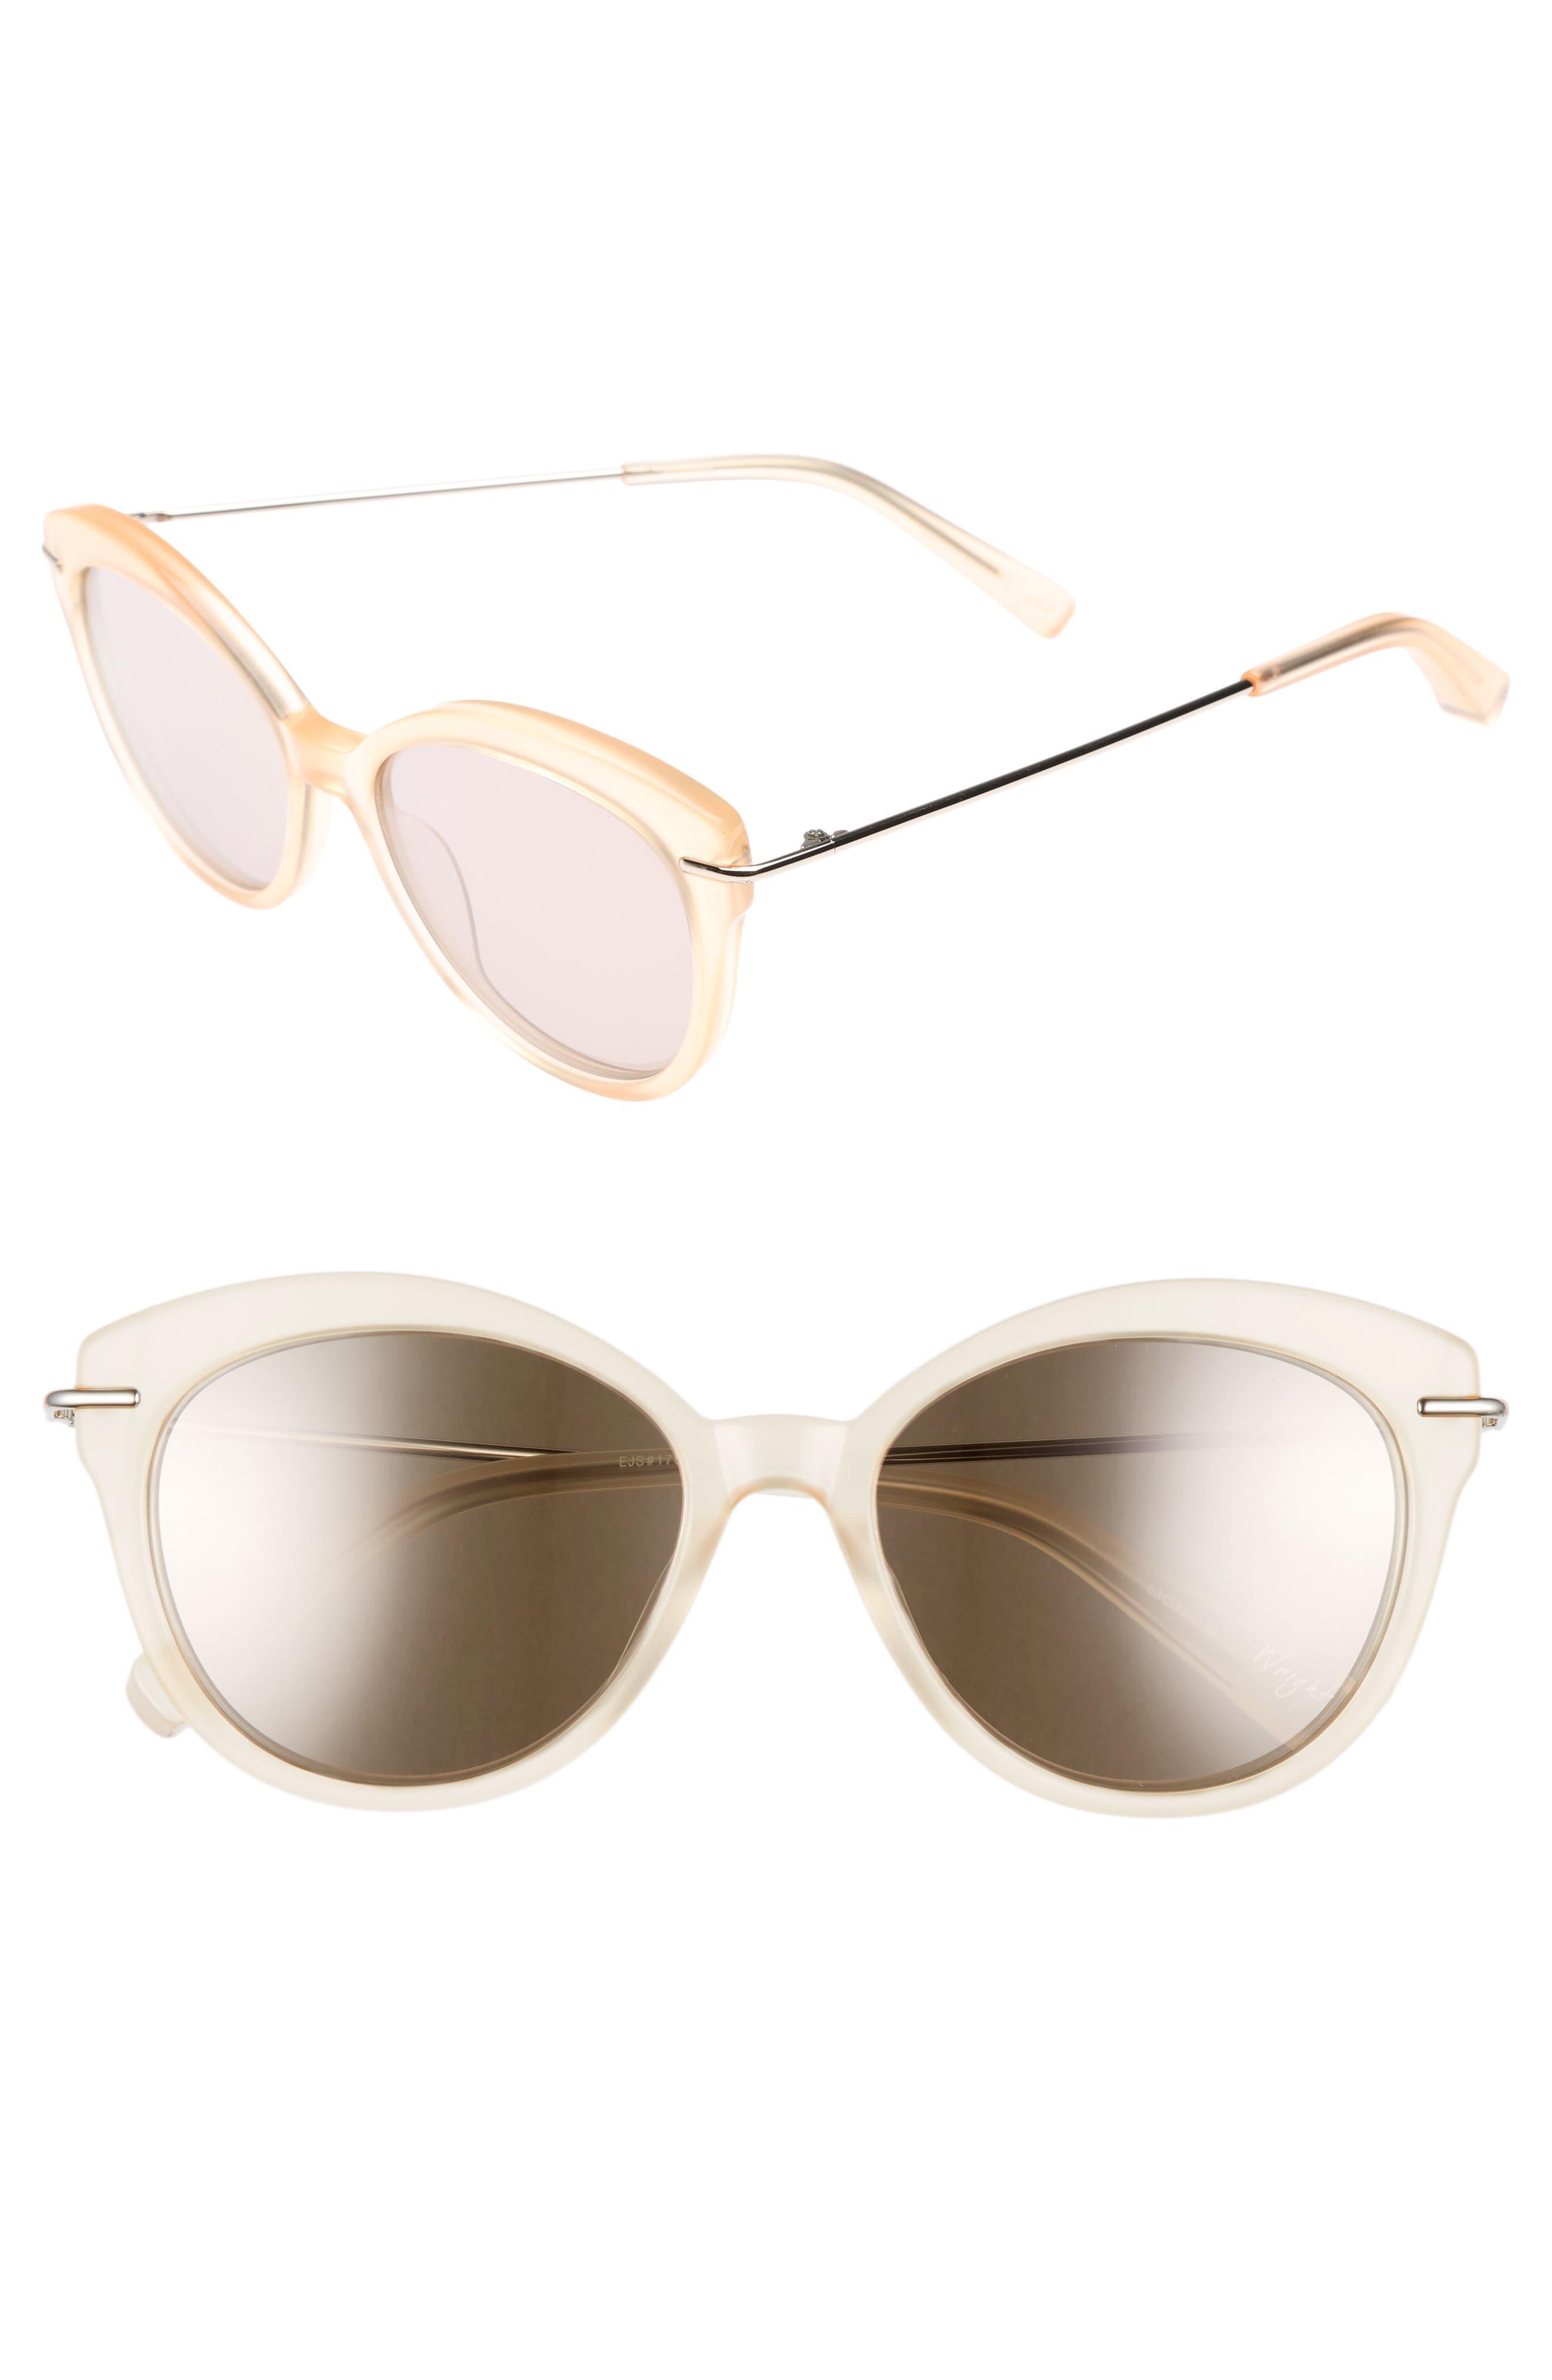 Wright 53mm Cat Eye Sunglasses,                         Main,                         color, Lemon